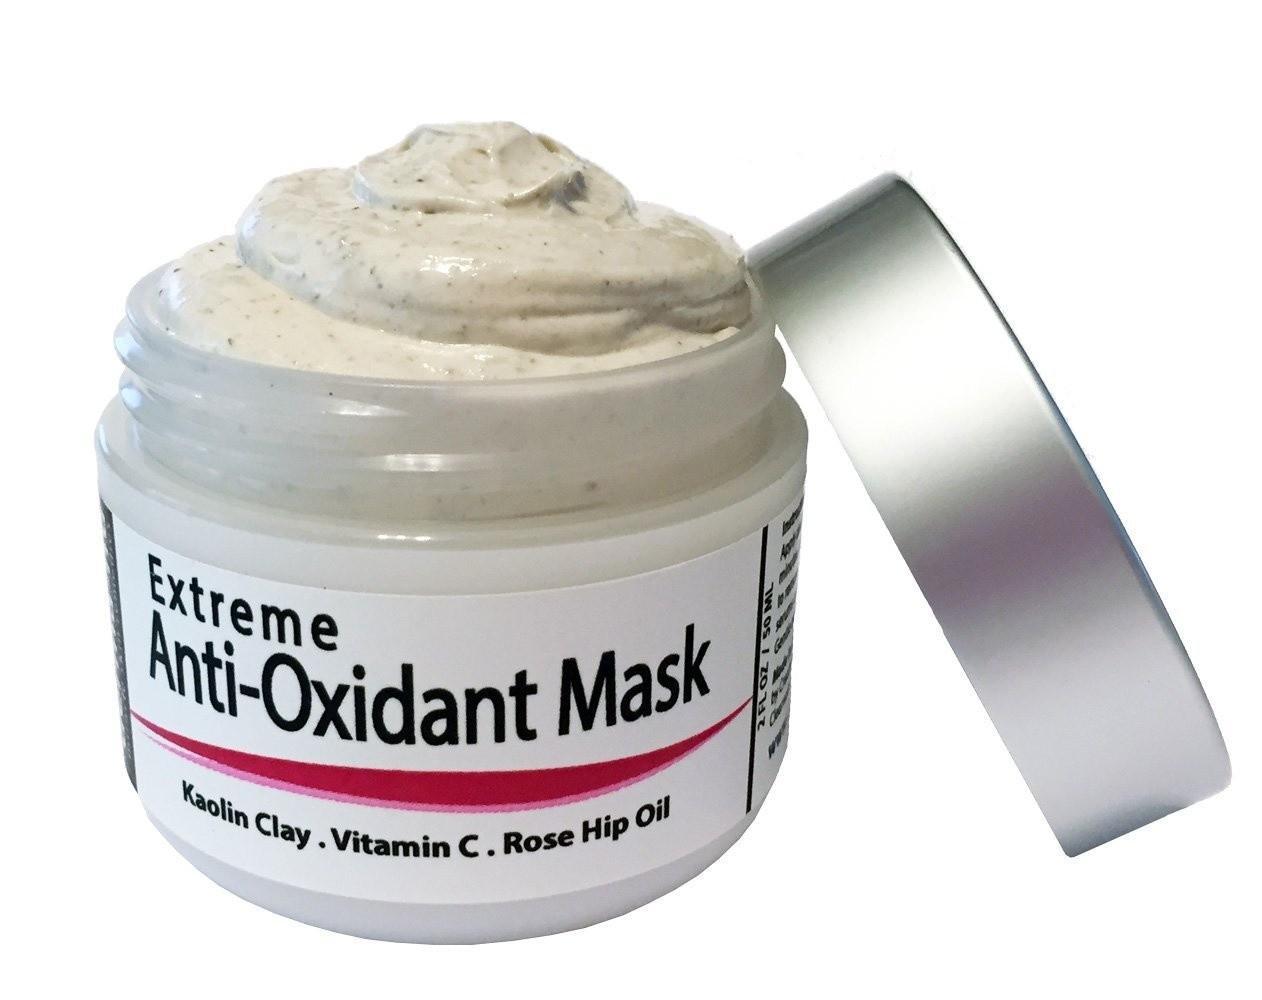 Derma-nu Extreme Antioxidant Mask